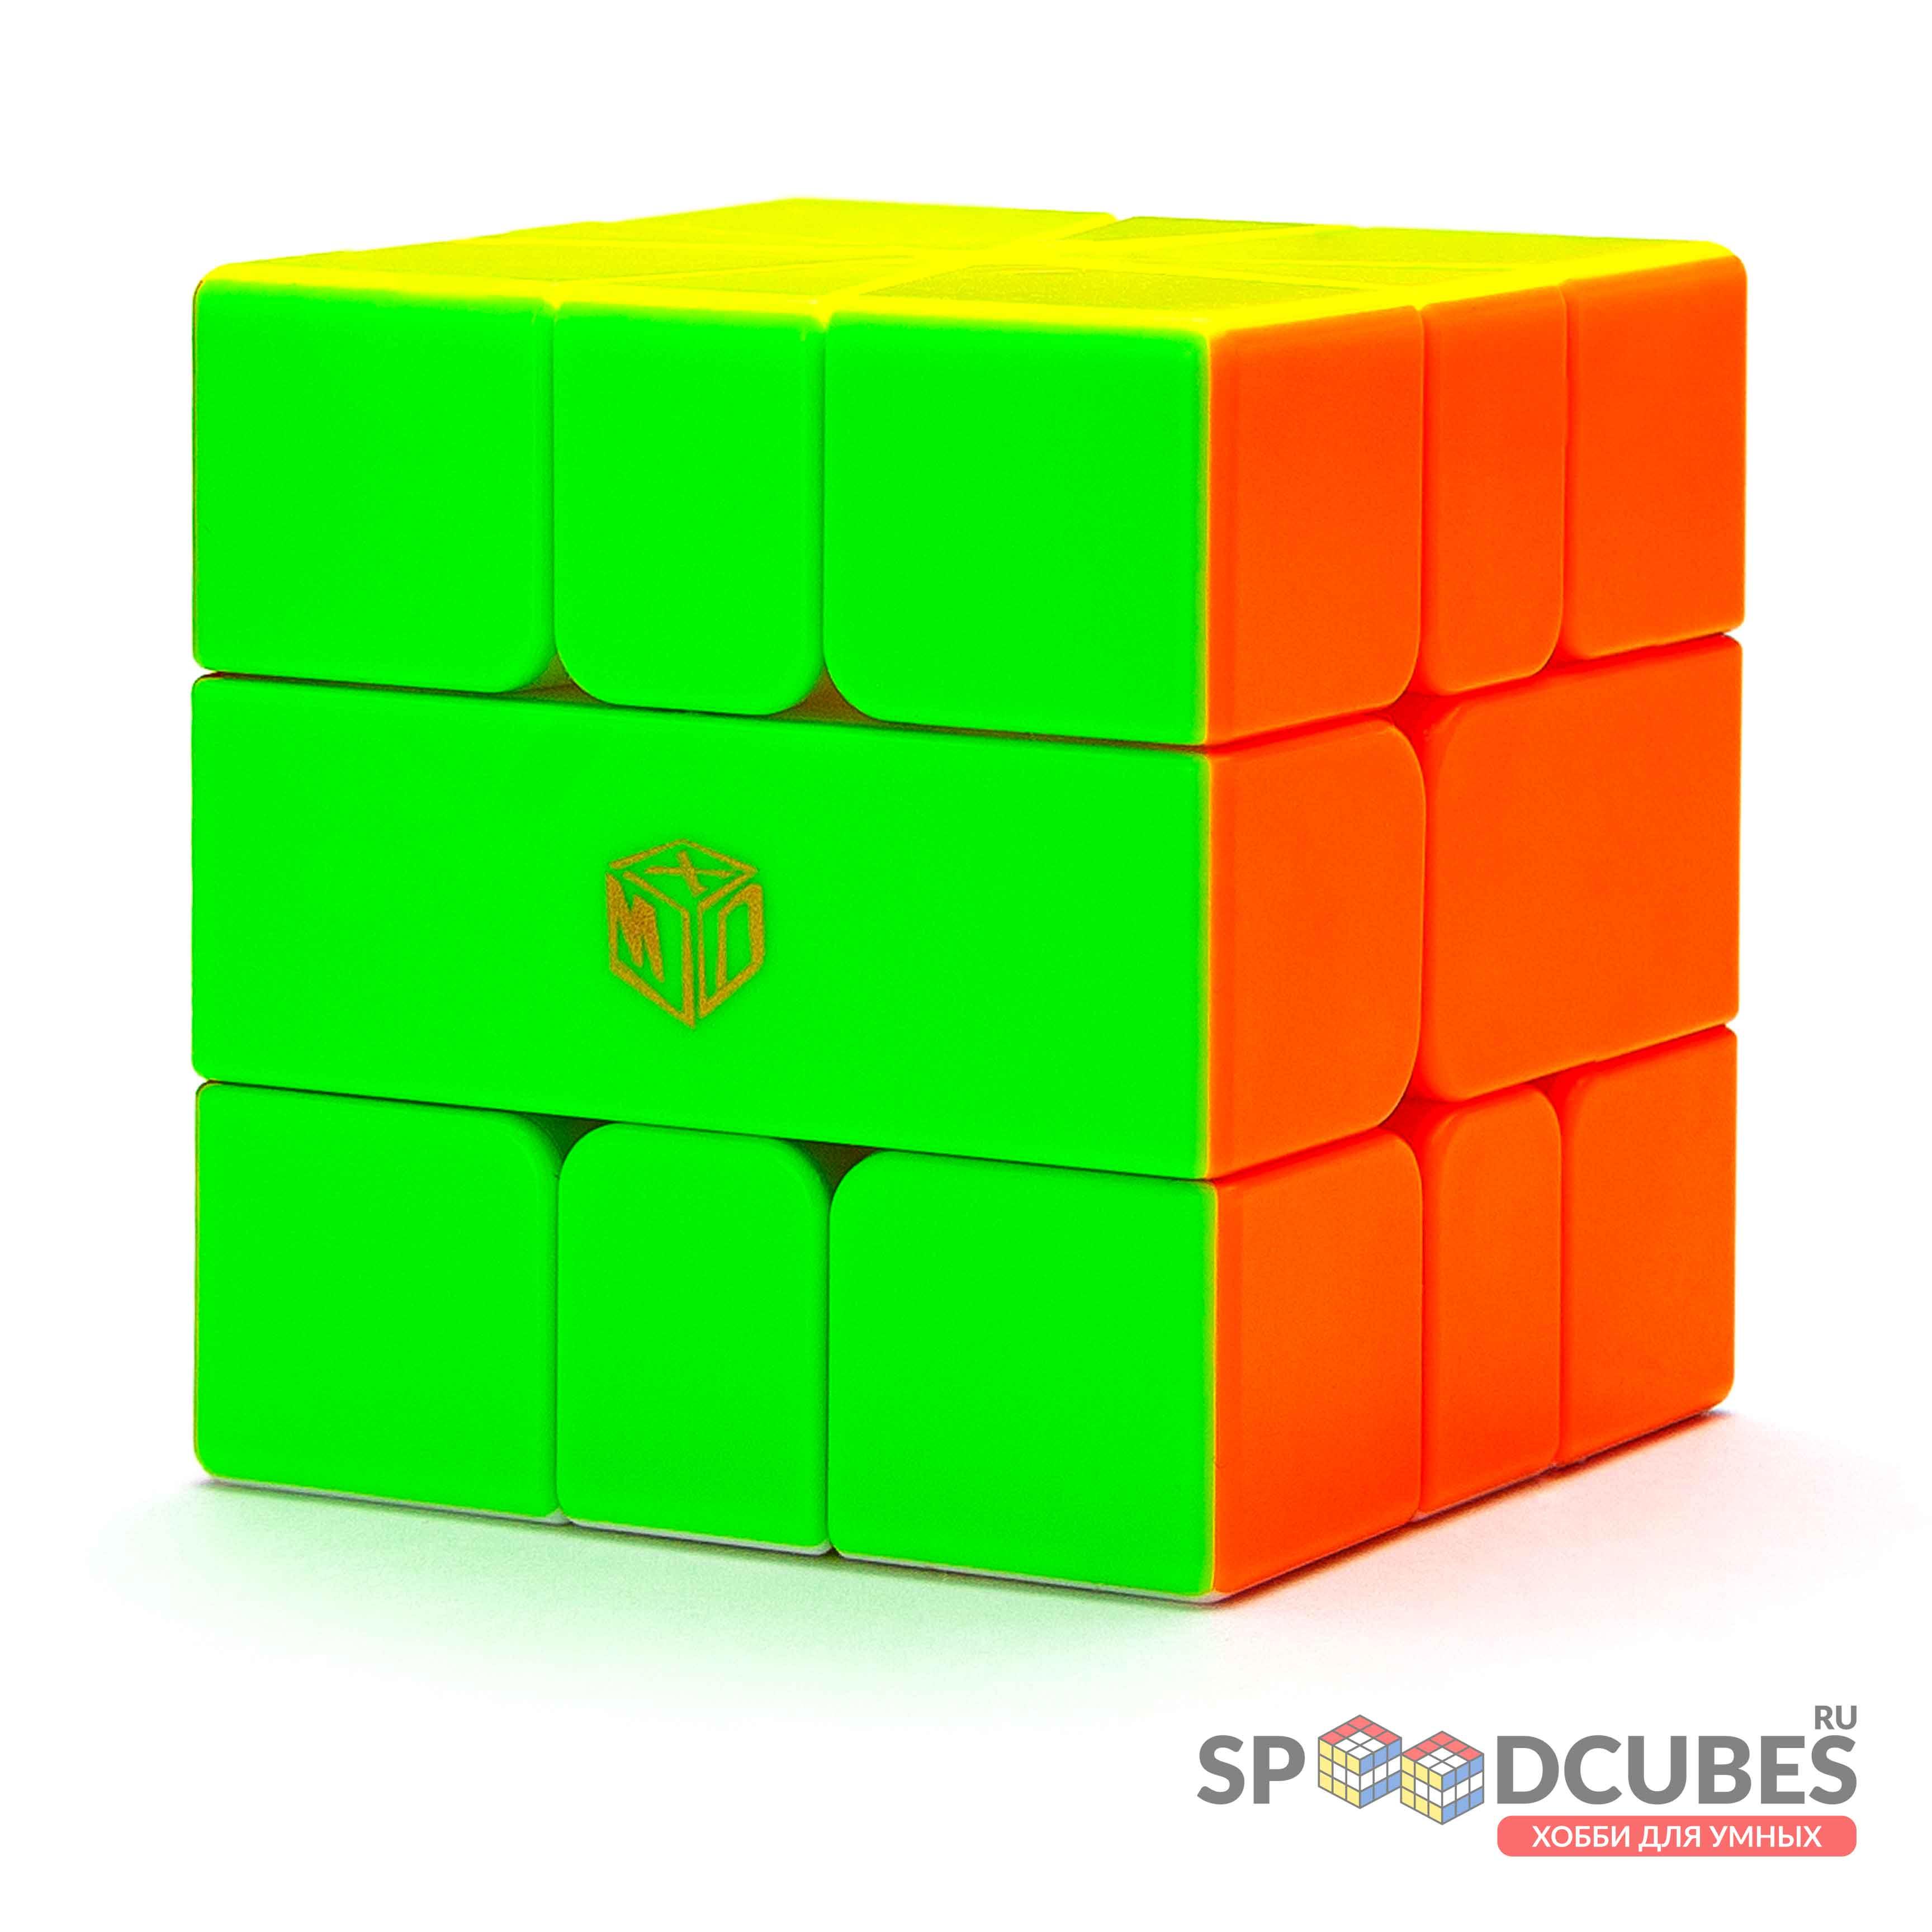 QiYi (MoFangGe) X-Man Volt Square-1 V2 Semi-Magnetic